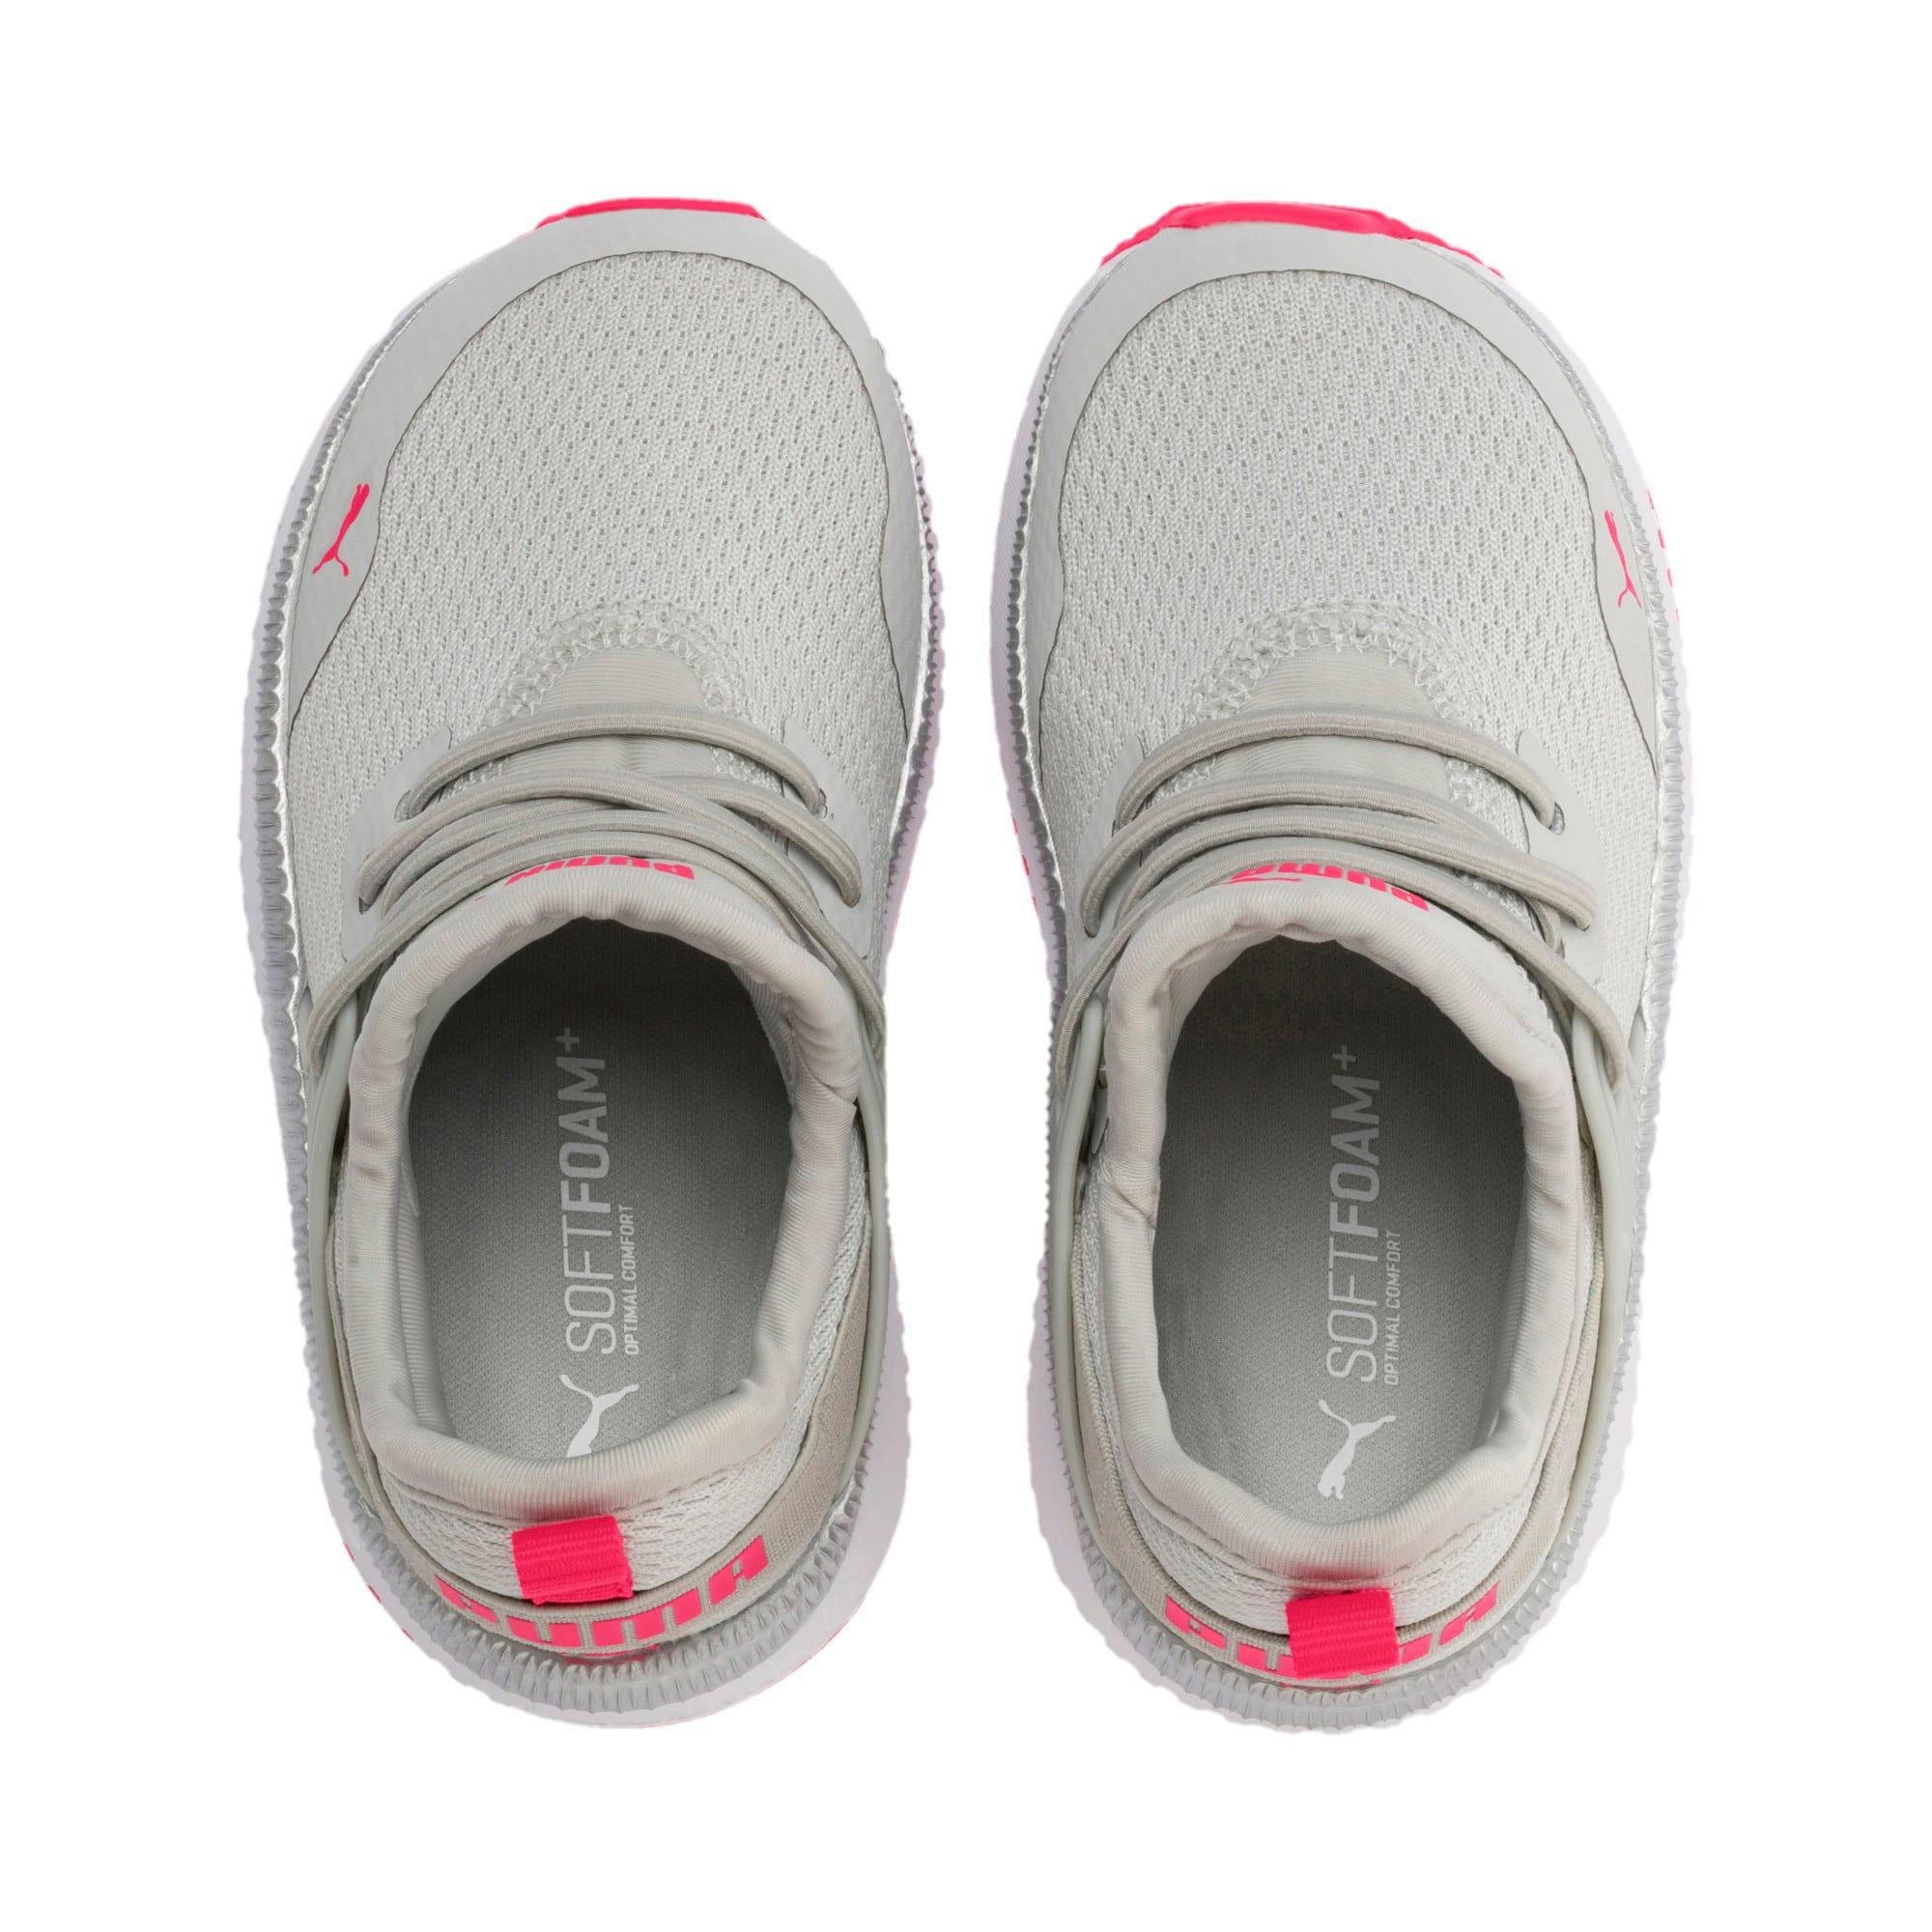 Thumbnail 6 of Pacer Next Cage Metallic Toddler Shoes, Gray Violet-Nrgy Rose, medium